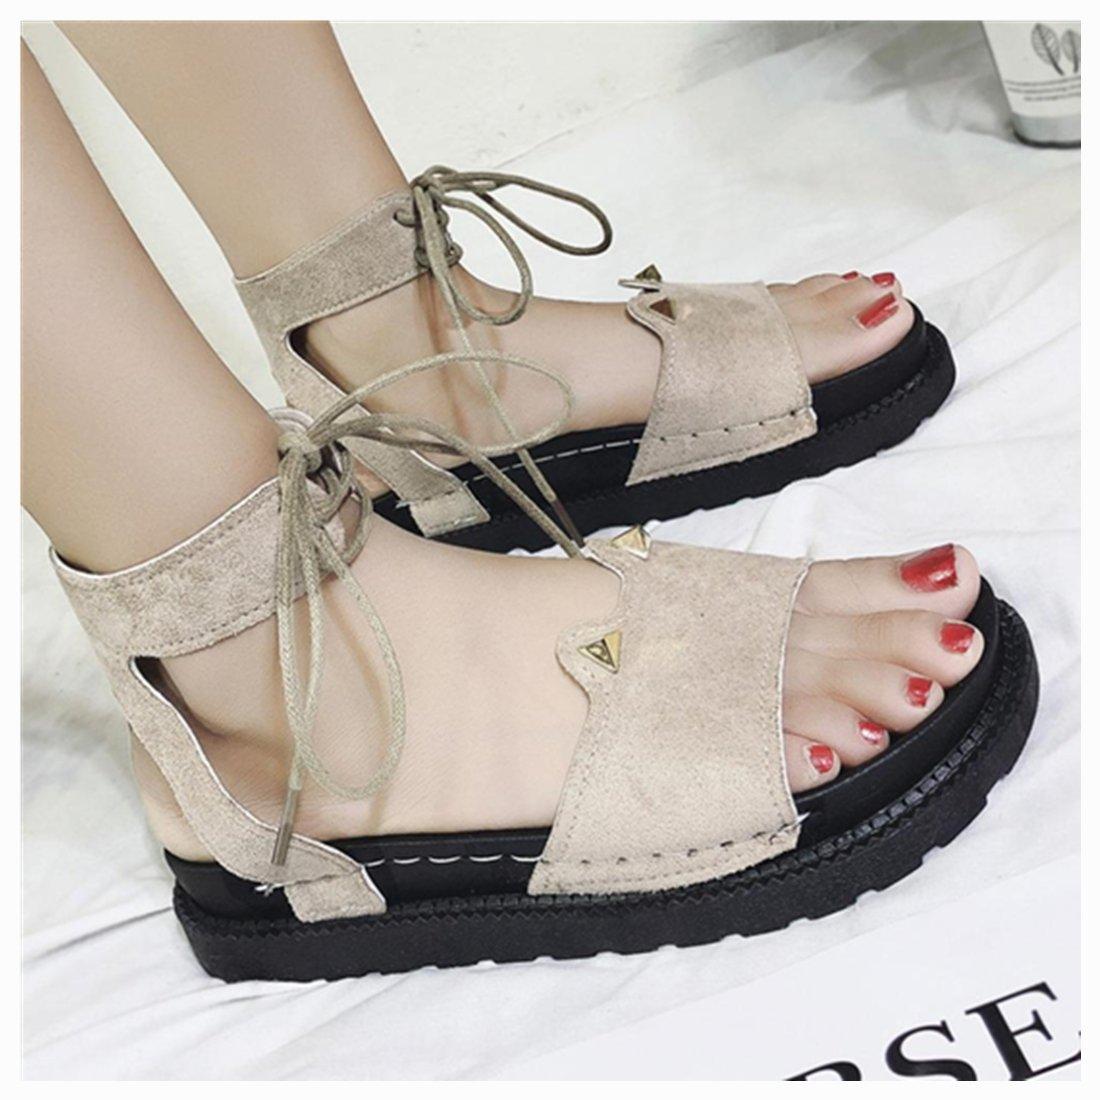 vermers Women Shoes Clearance - Summer Fashion Style Sandals Flat Waterproof Bandage Cute Girl Sandals(US:5.5, Khaki)